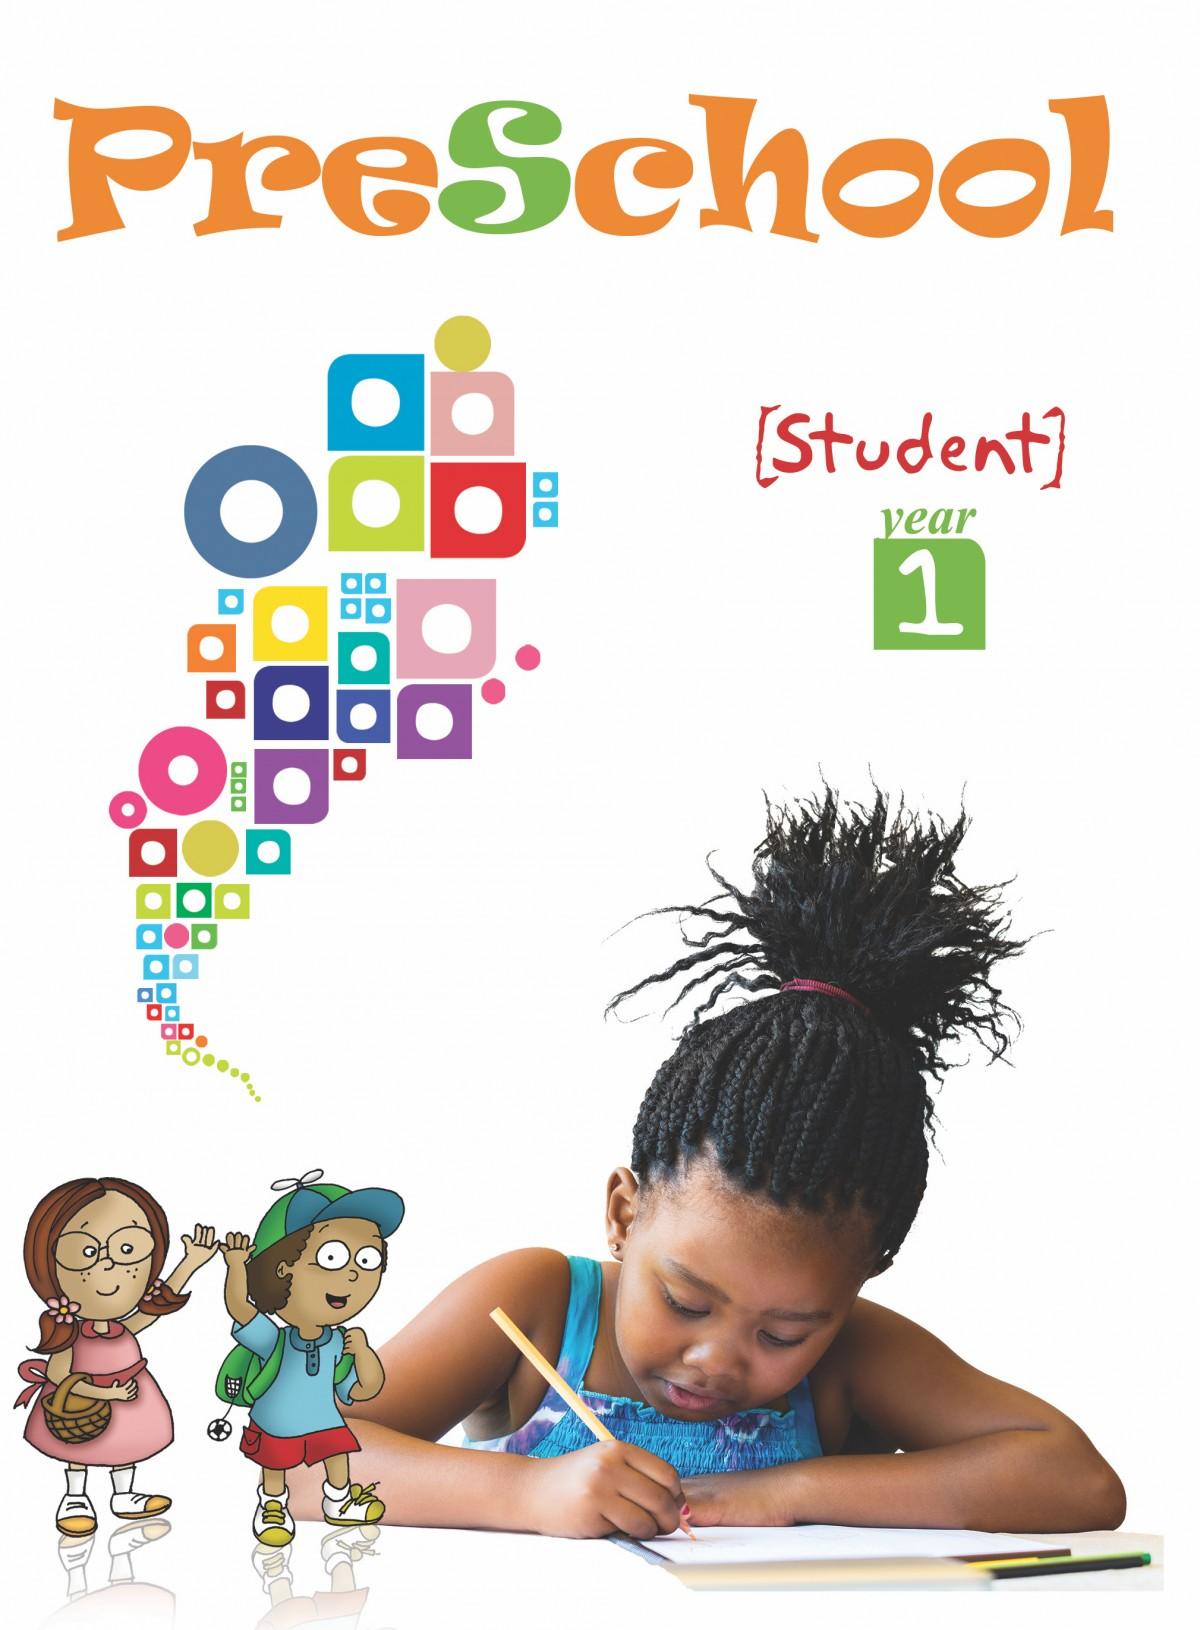 Preschool Sunday School Student Activity Worksheets Year